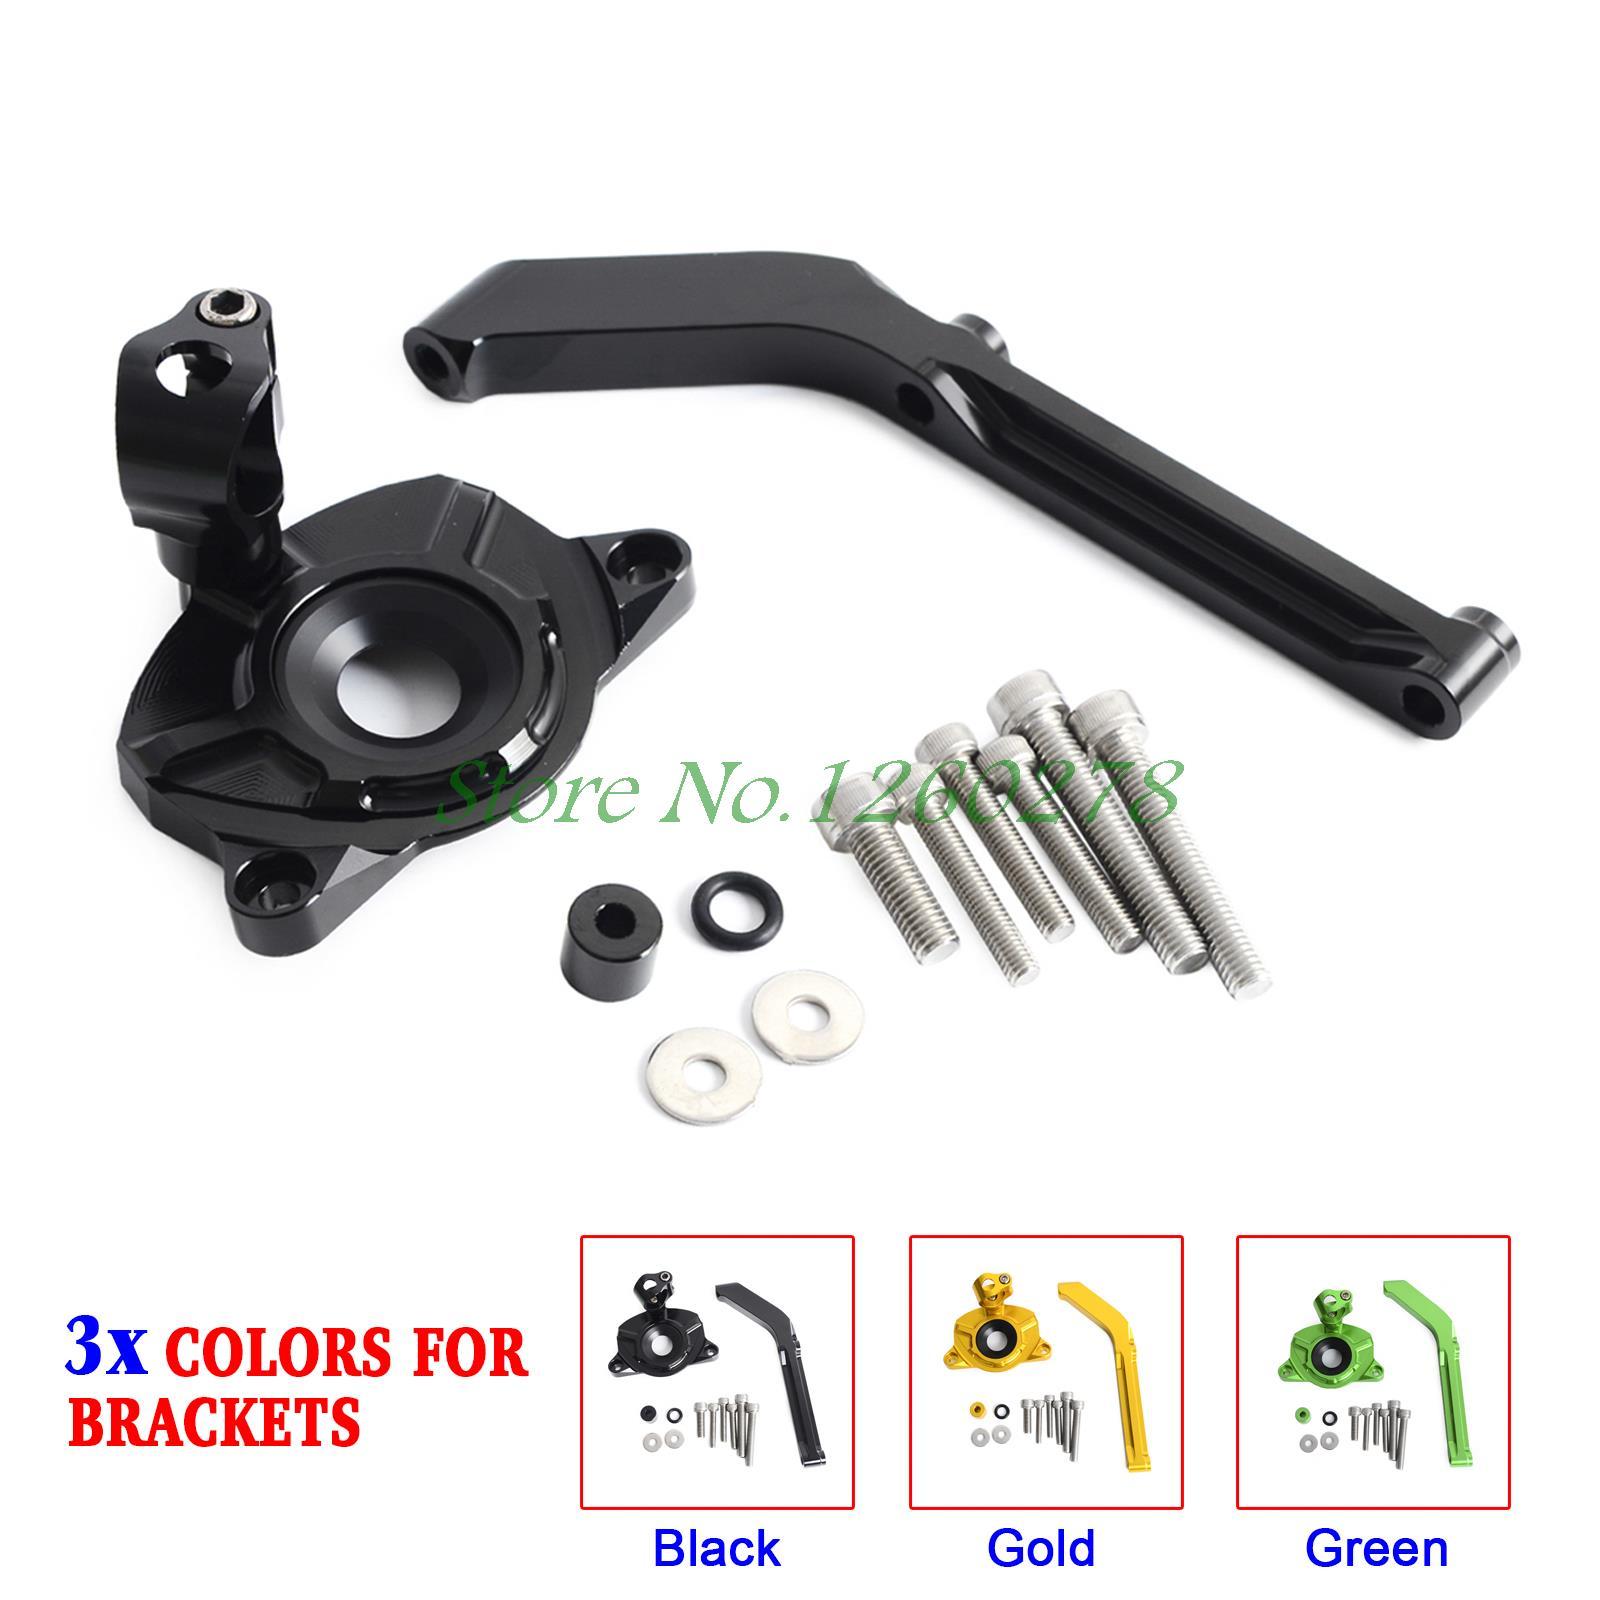 Здесь можно купить   Motorcycle Steering Damper Mounting Bracket for Kawasaki Z1000/ABS 14-17 (Not Fit Z1000SX) Автомобили и Мотоциклы